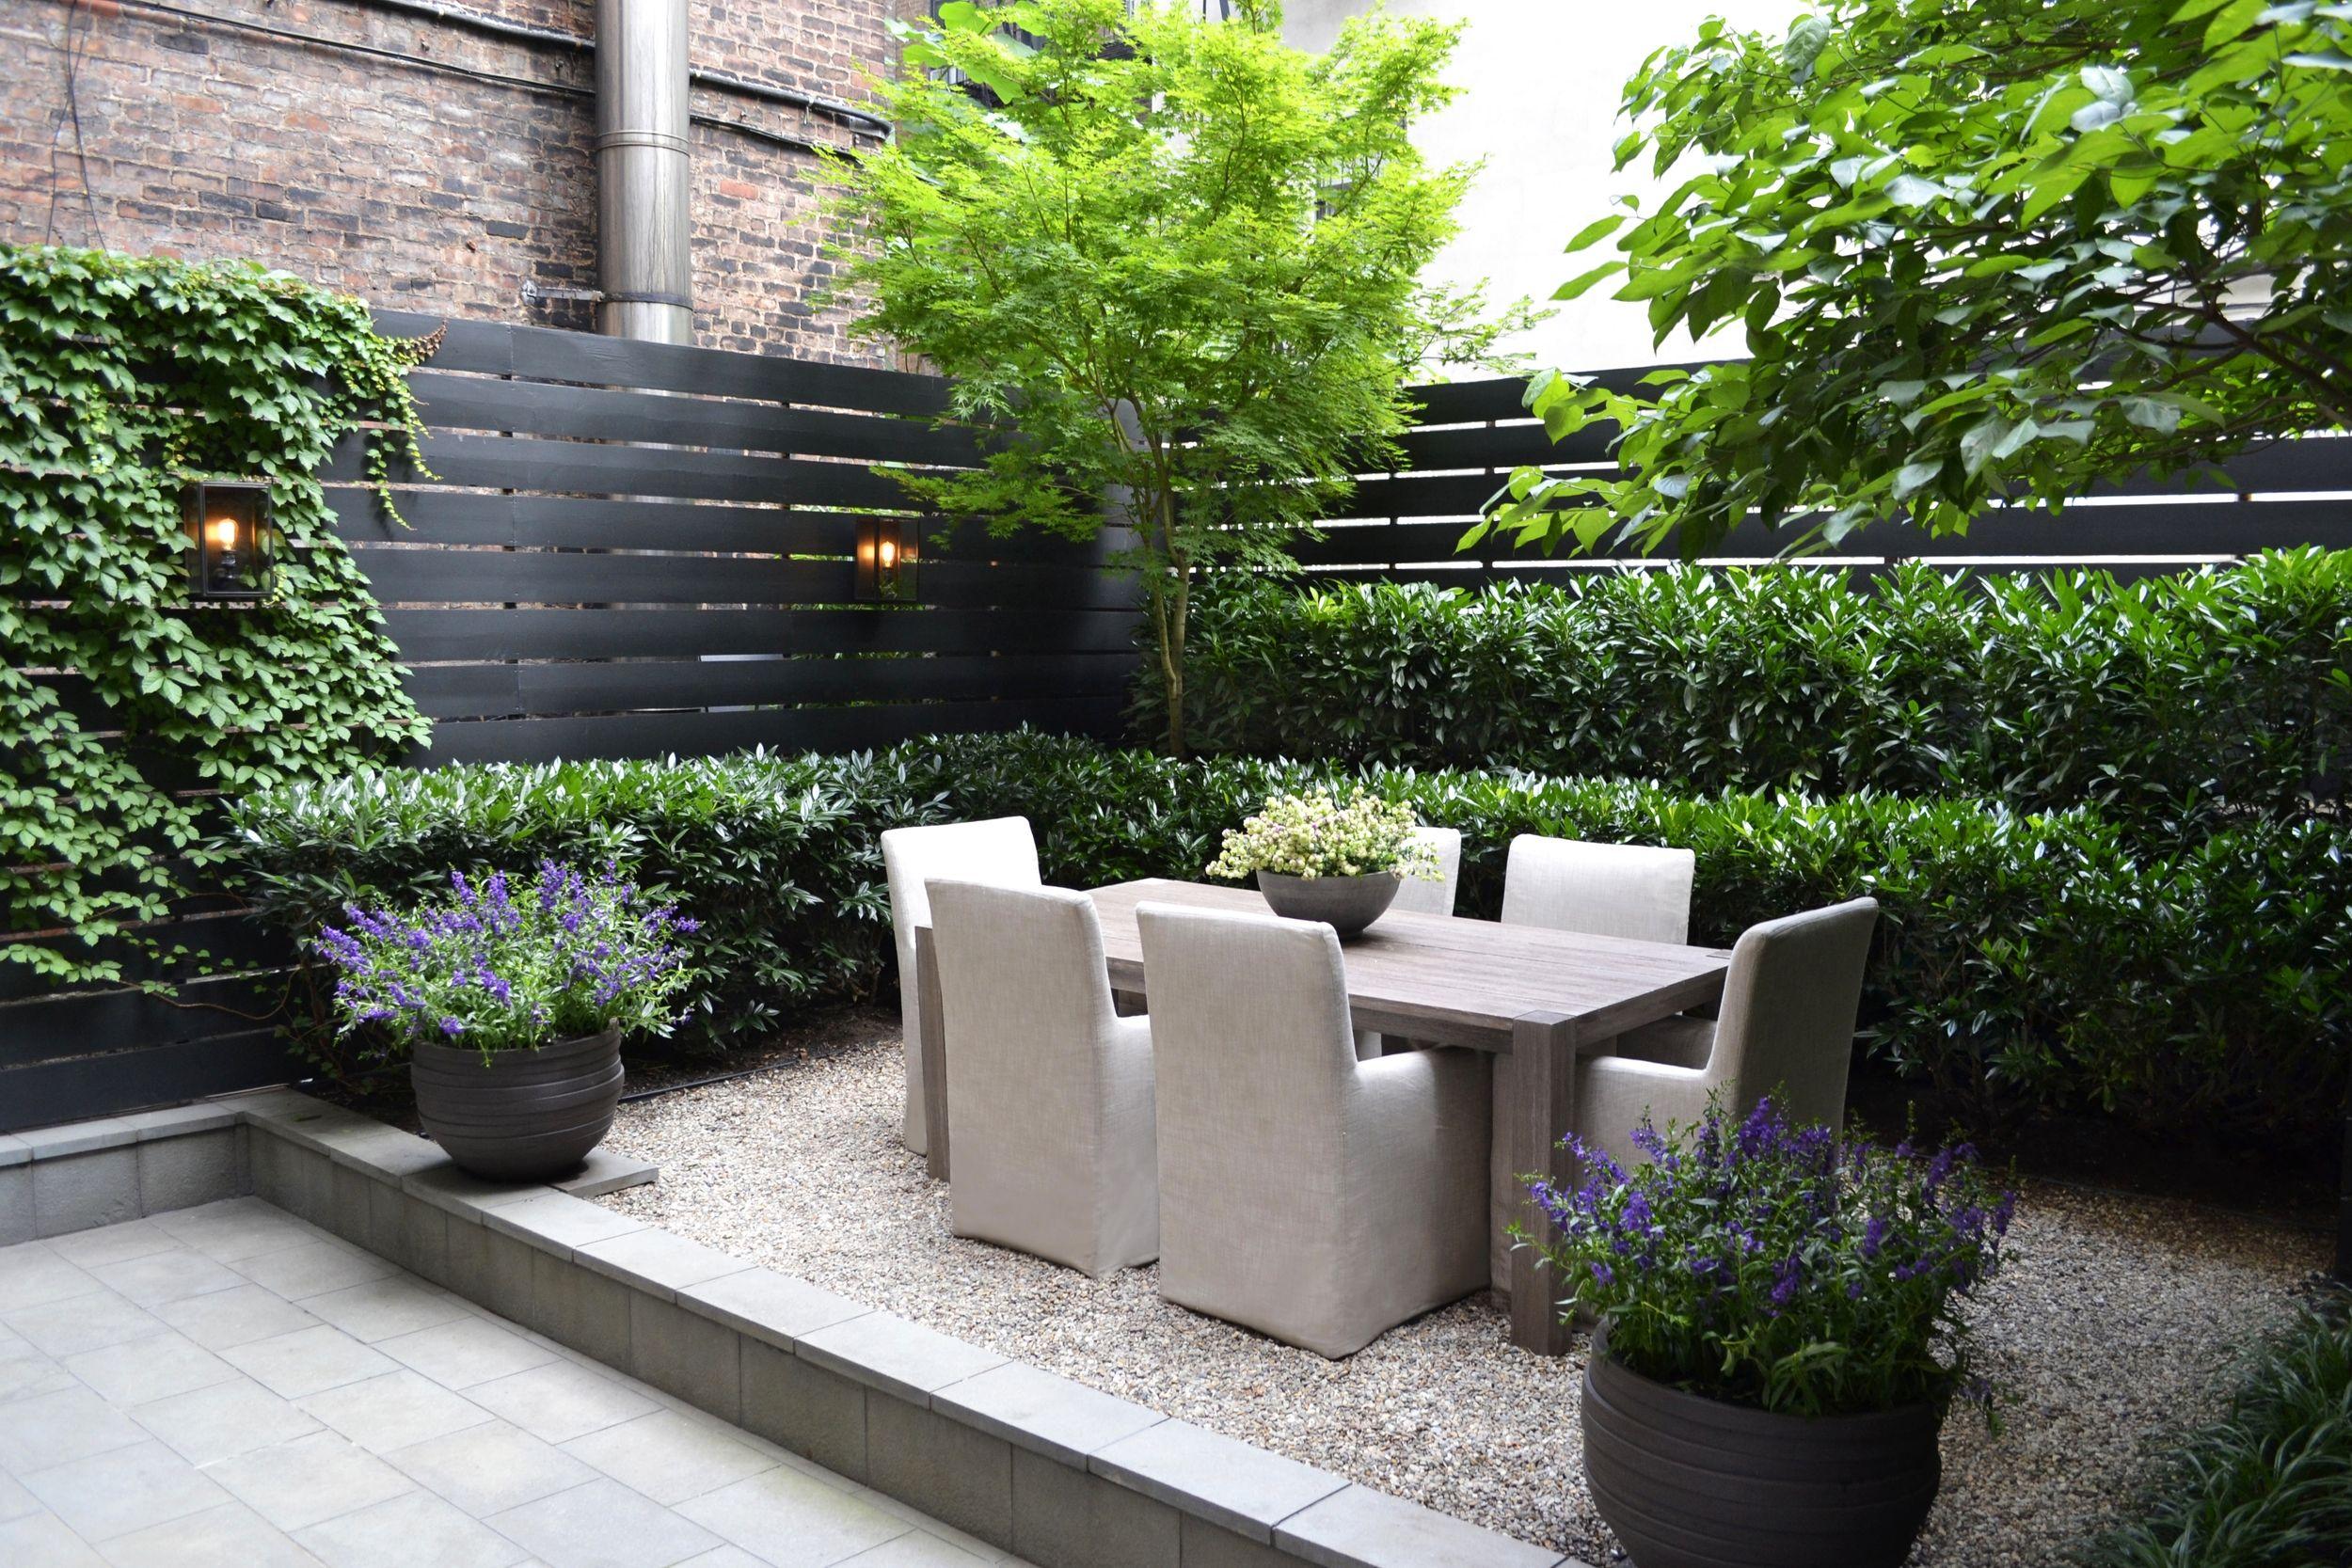 Harrison Green Courtyard Gardens Design Townhouse Garden